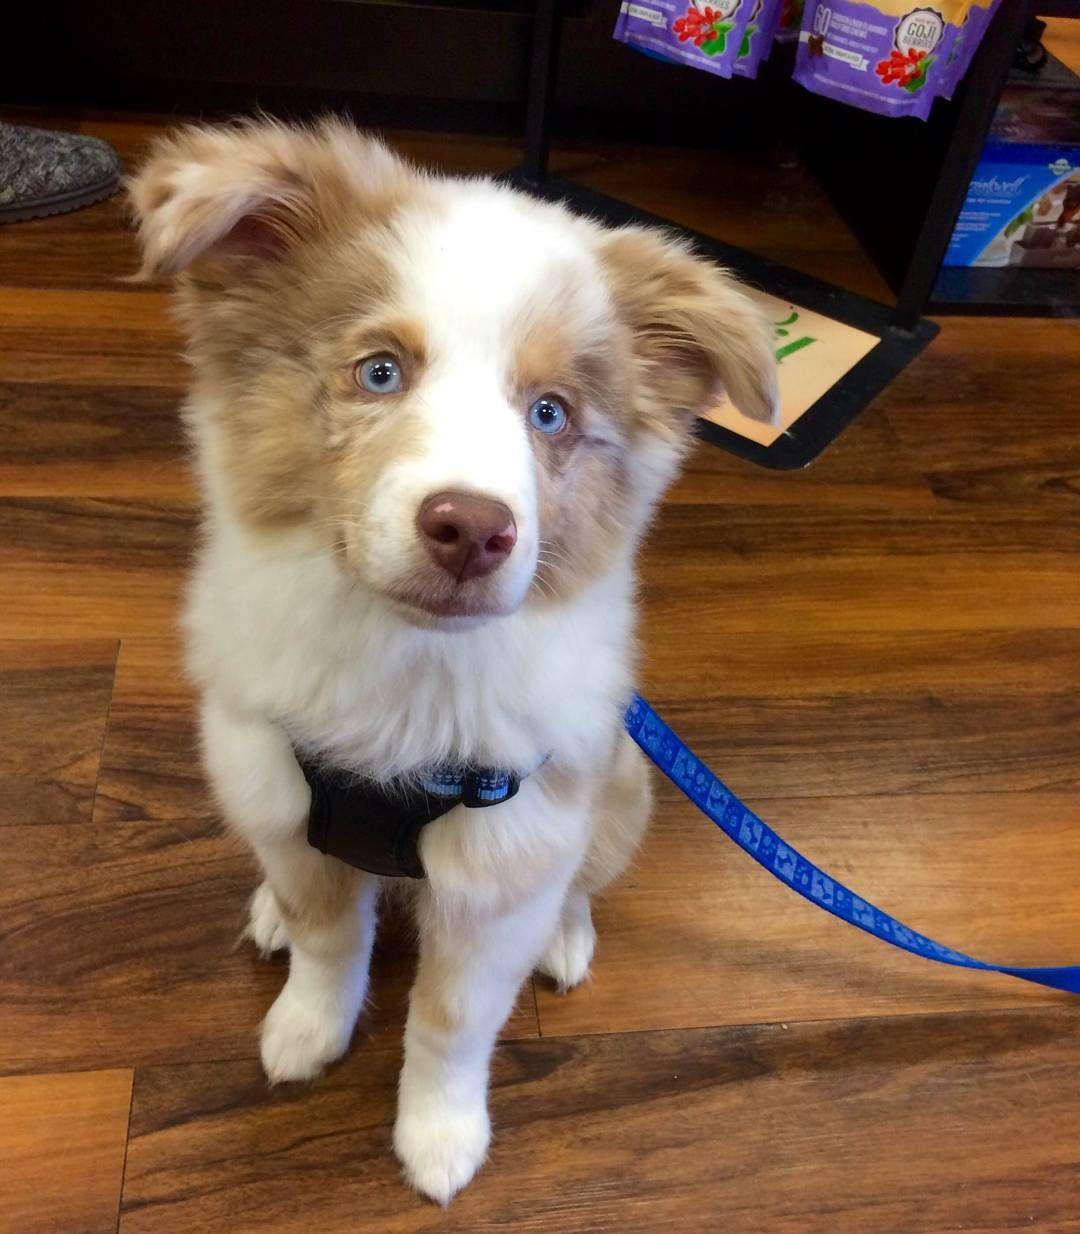 Petvalu Us On Instagram Meet Gizmo Our Cutecustomeralert From Pet Valu Philadelphia Pa Grant Ave Gizmo Is A 4 Puppy Dog Eyes Australian Shepherd Pets